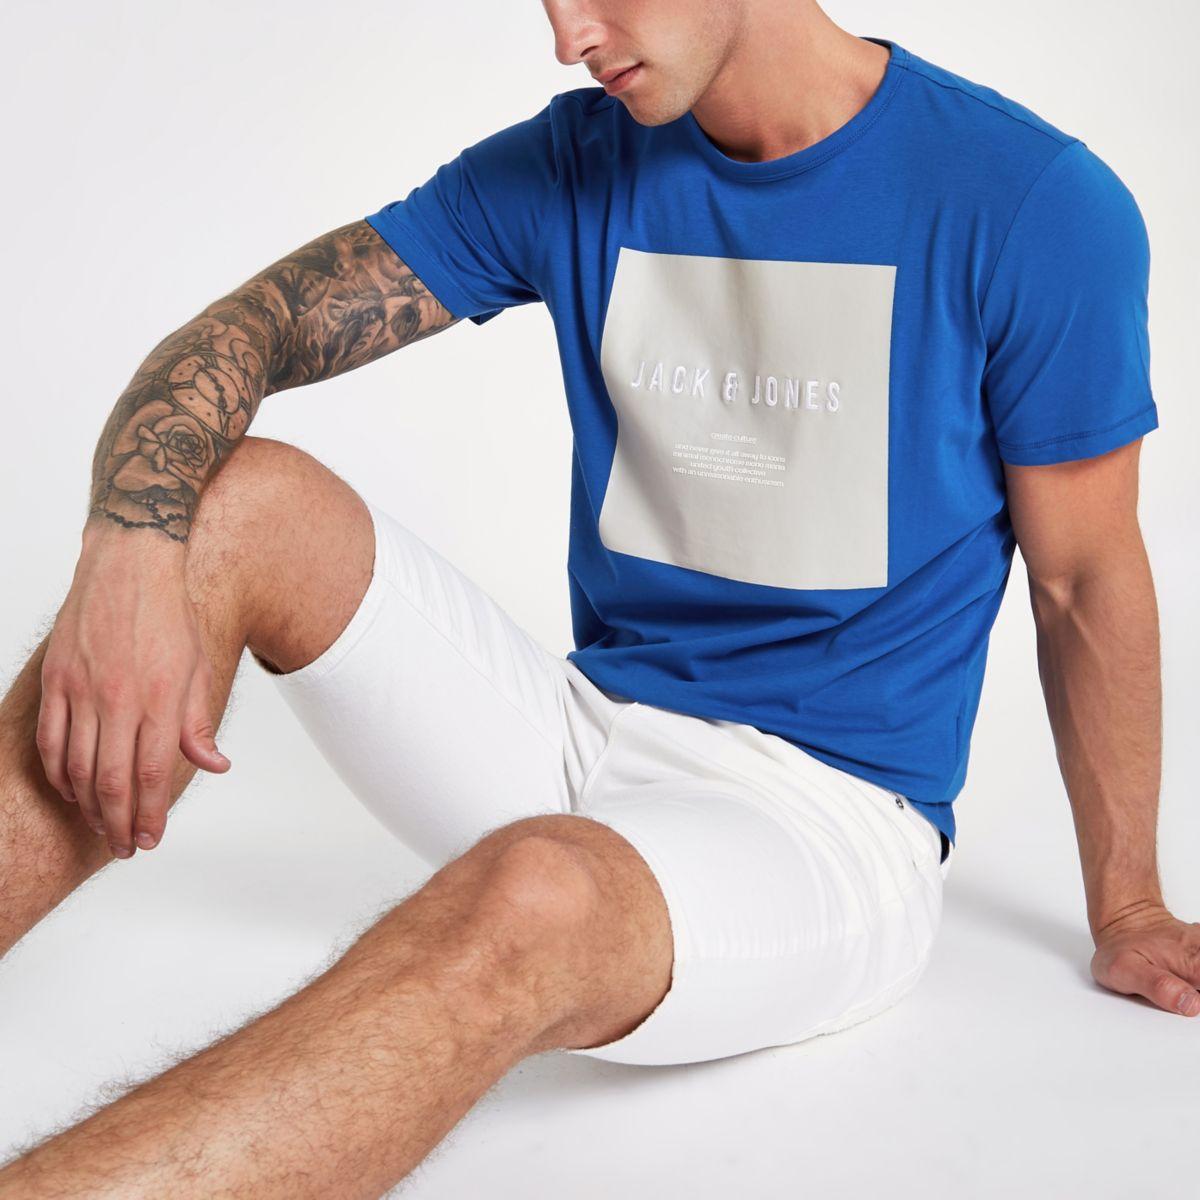 Jack & Jones blue 'create culture' T-shirt